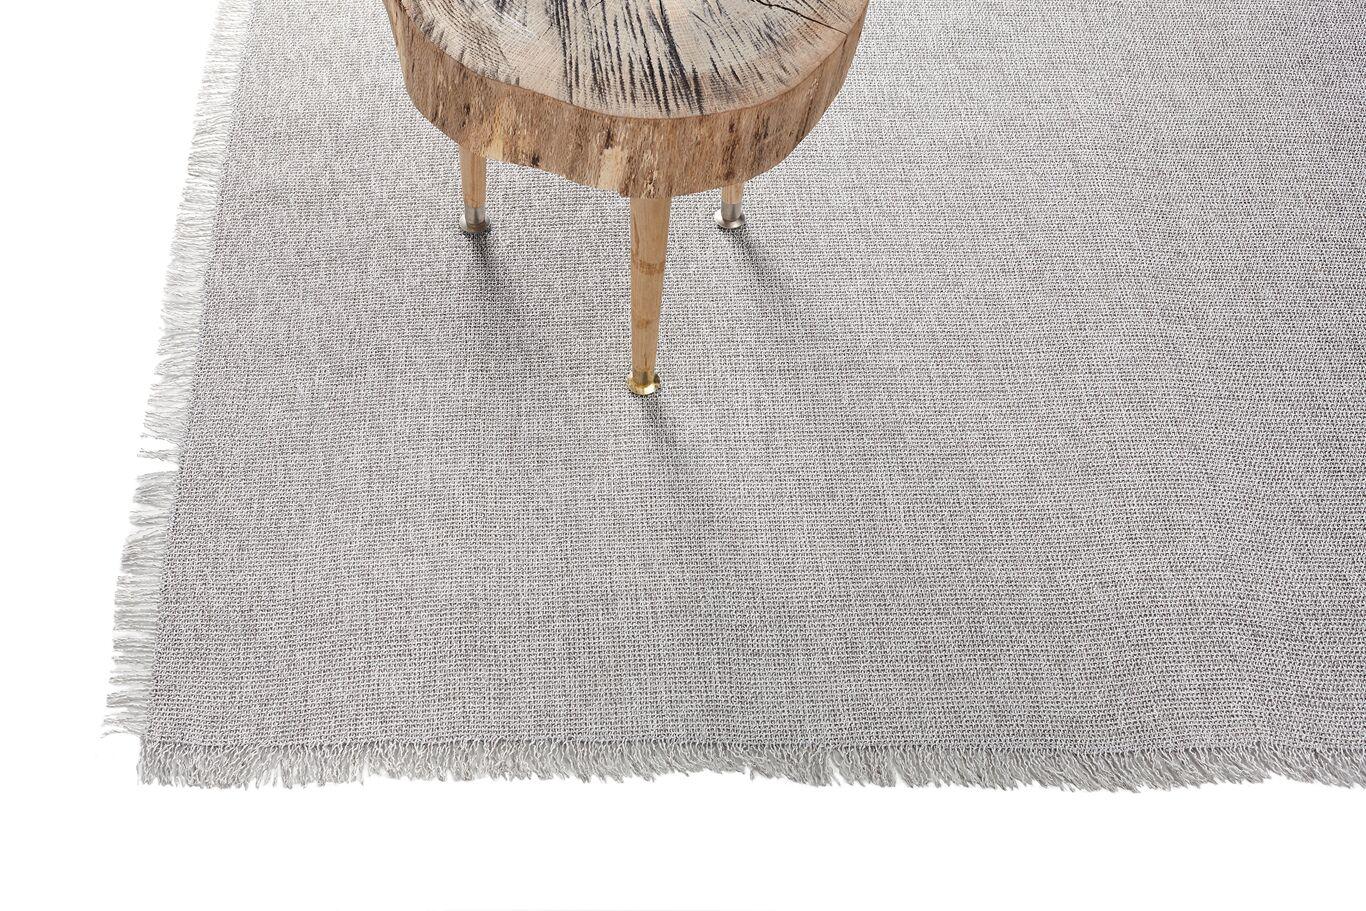 Market Fringe Gray Indoor/Outdoor Area Rug Rug Size: Rectangle 4'10 x 7